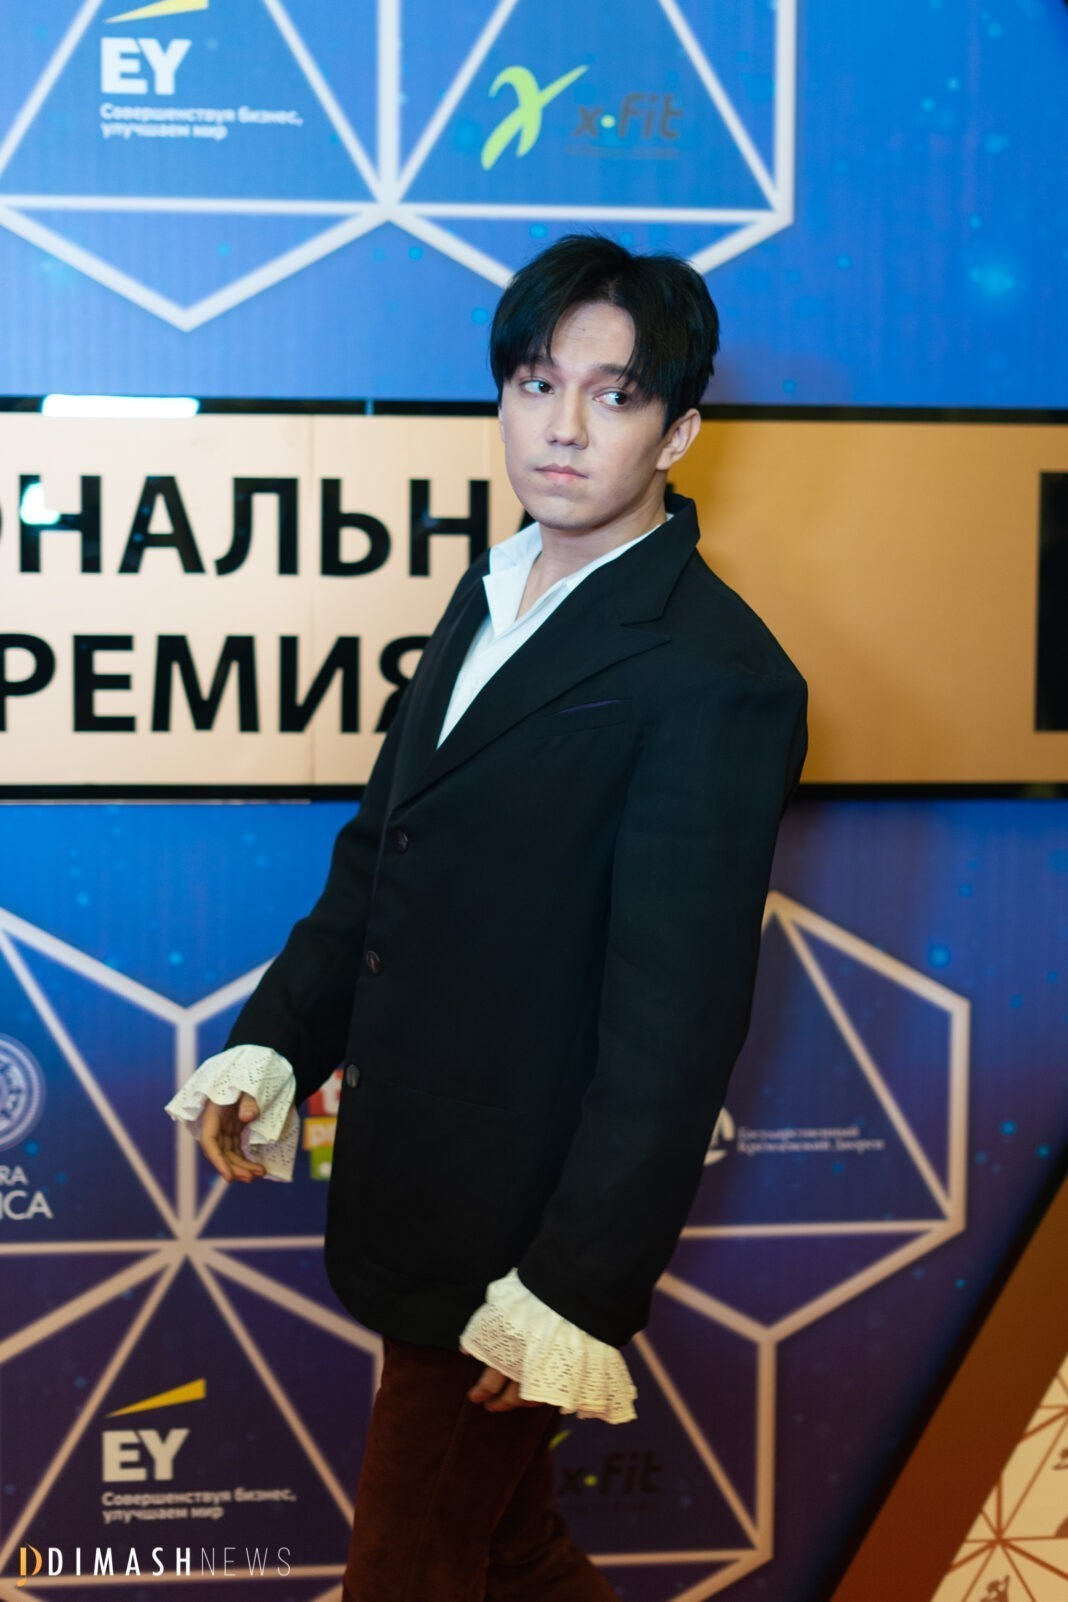 Victoria 2020 Award Part 2 (December 3, 2020)